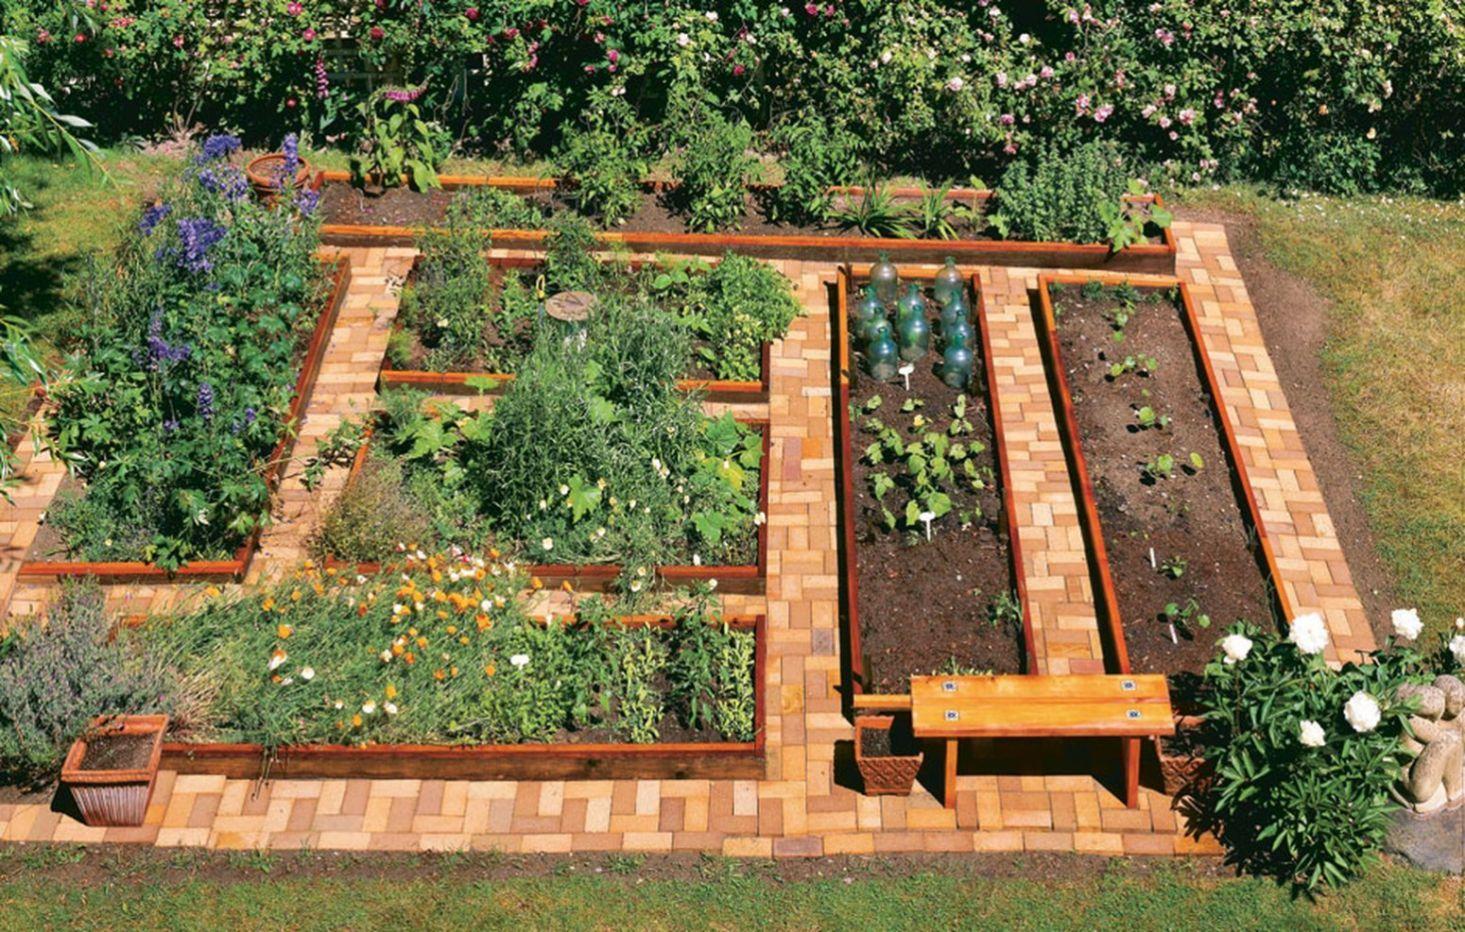 Affordable Backyard Vegetable Garden Designs Ideas 32 Garden Layout Vegetable Garden Raised Beds Garden Layout Vegetable